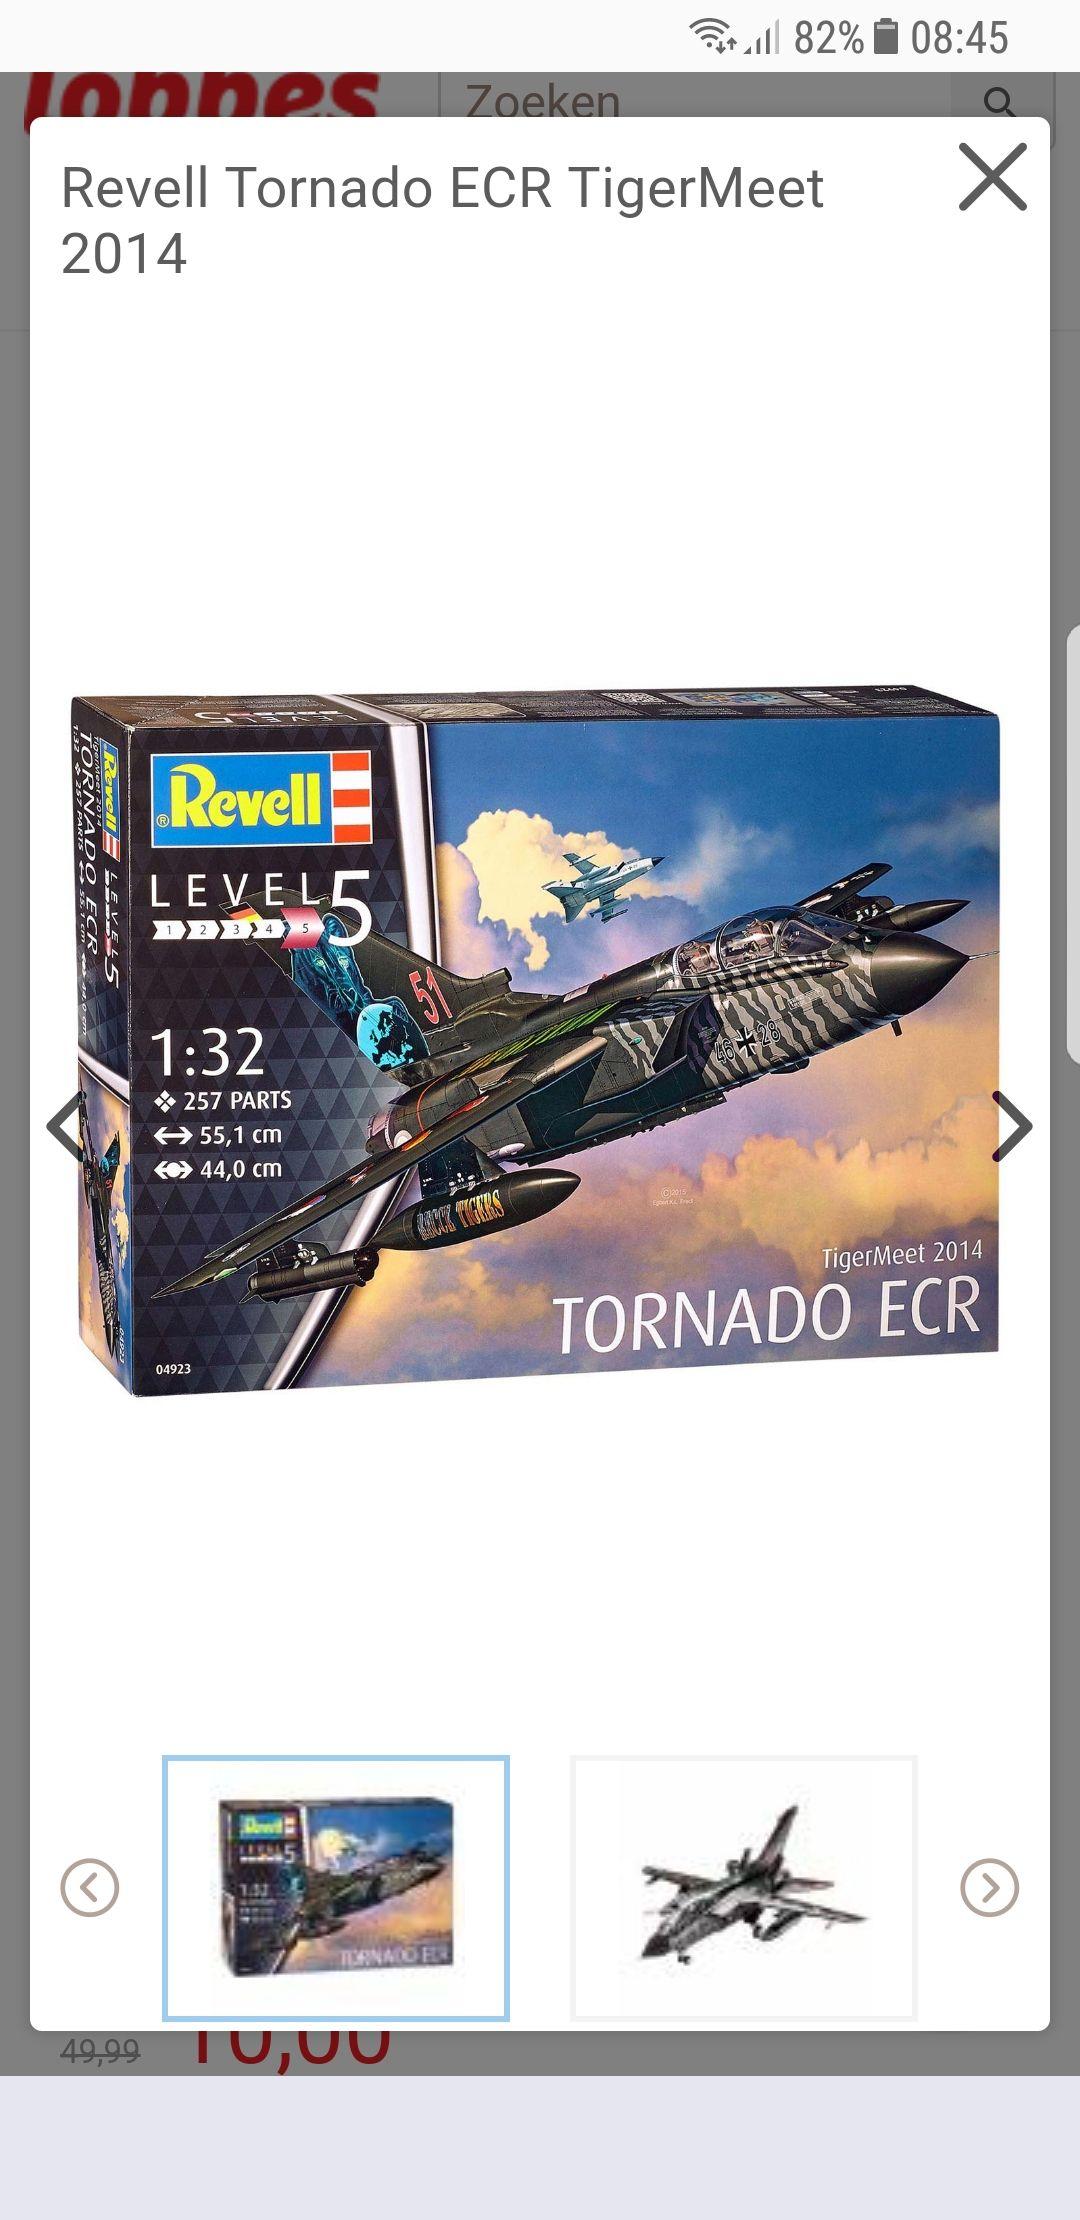 Donderdagdeal bij Lobbes.nl Revell Tornado ECR TigerMeet 2014